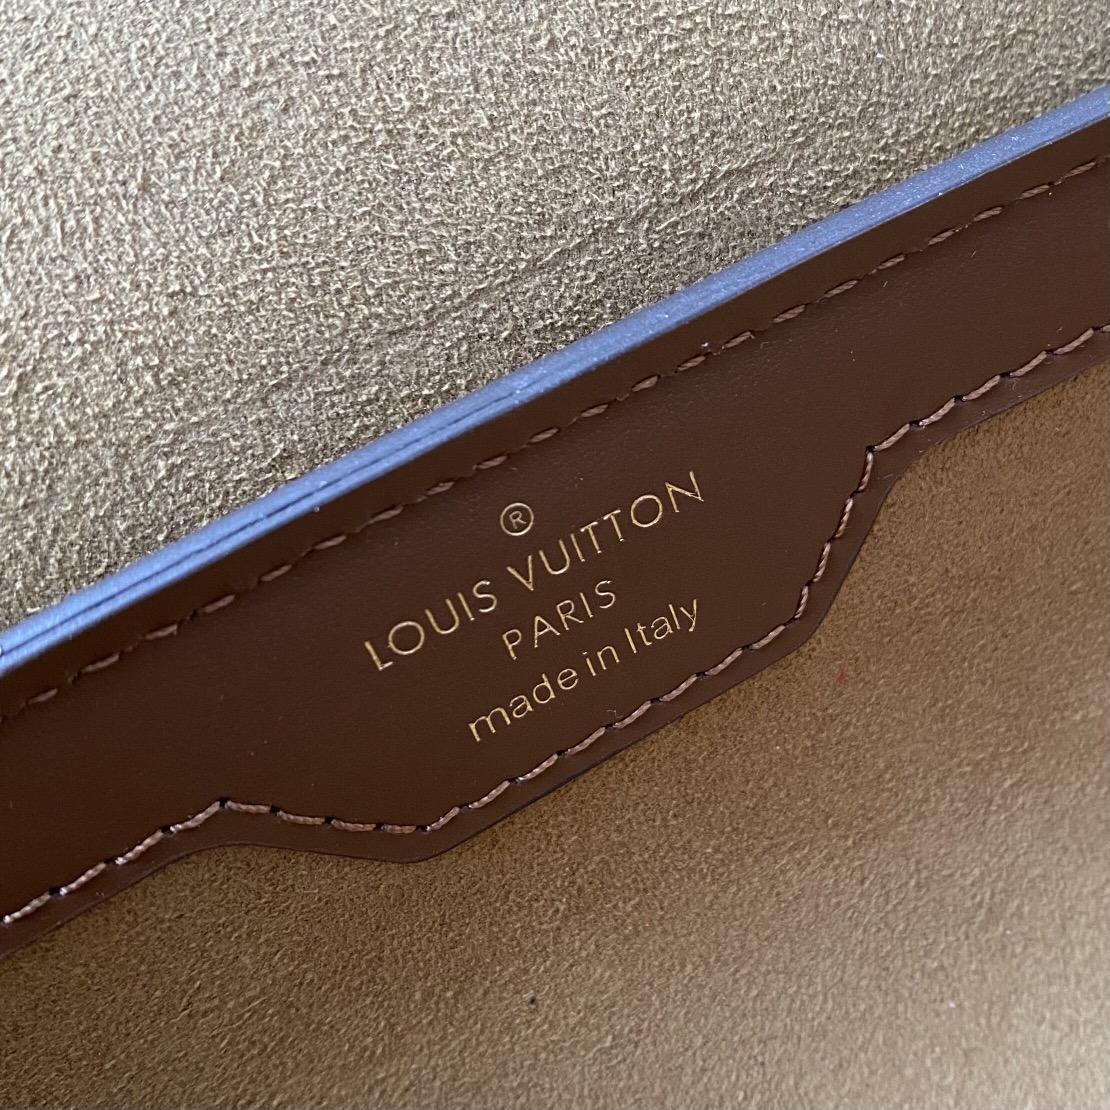 【¥1530】LV年度爆款Papillon Trunk圆筒包57835 经典老花搭配深色牛皮